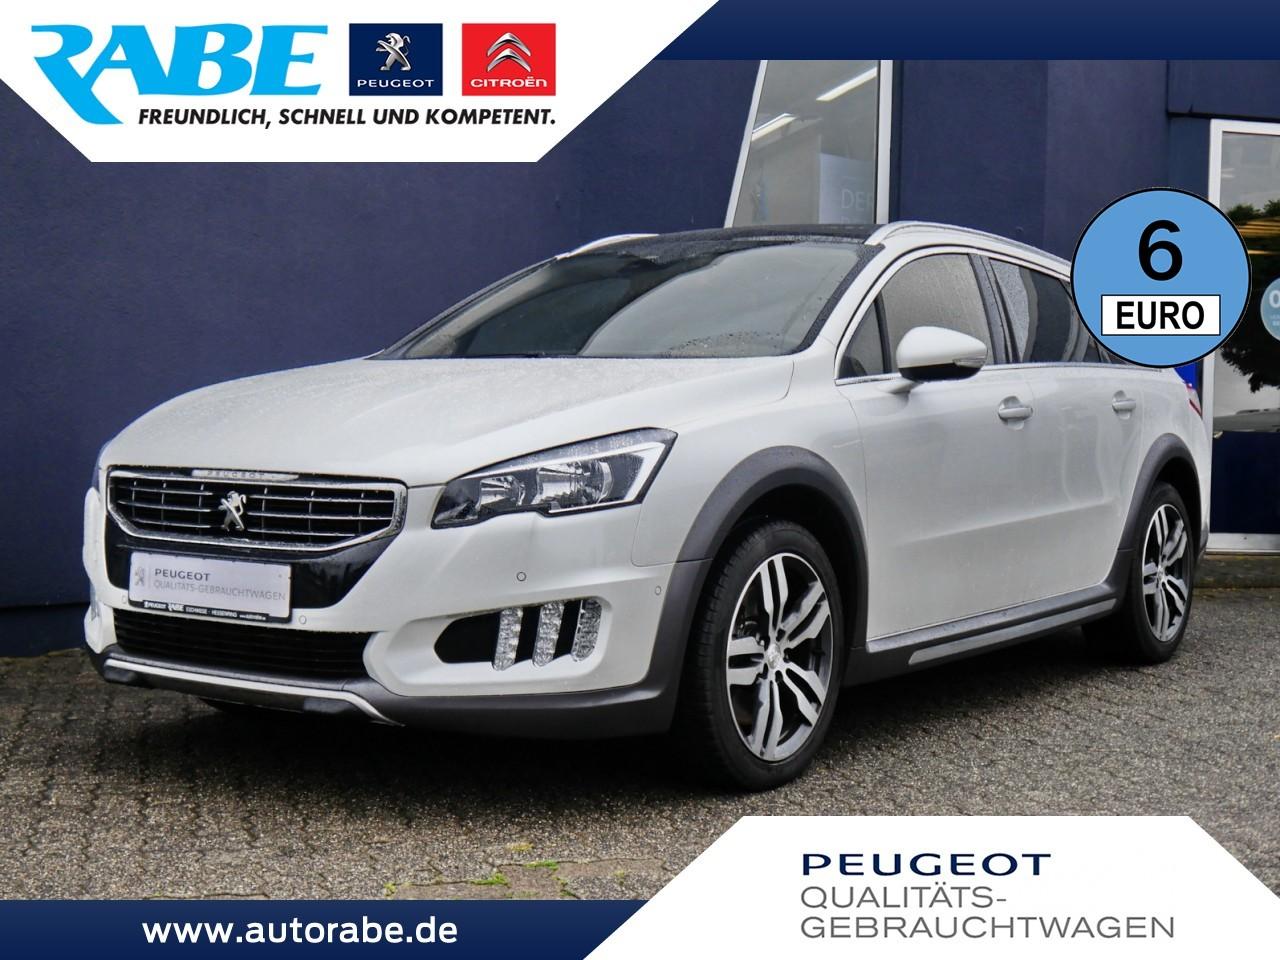 Peugeot 508 SW RXH 180 BlueHDi Pano+NAV+E-Heckkl+E-Sitze, Jahr 2016, Diesel